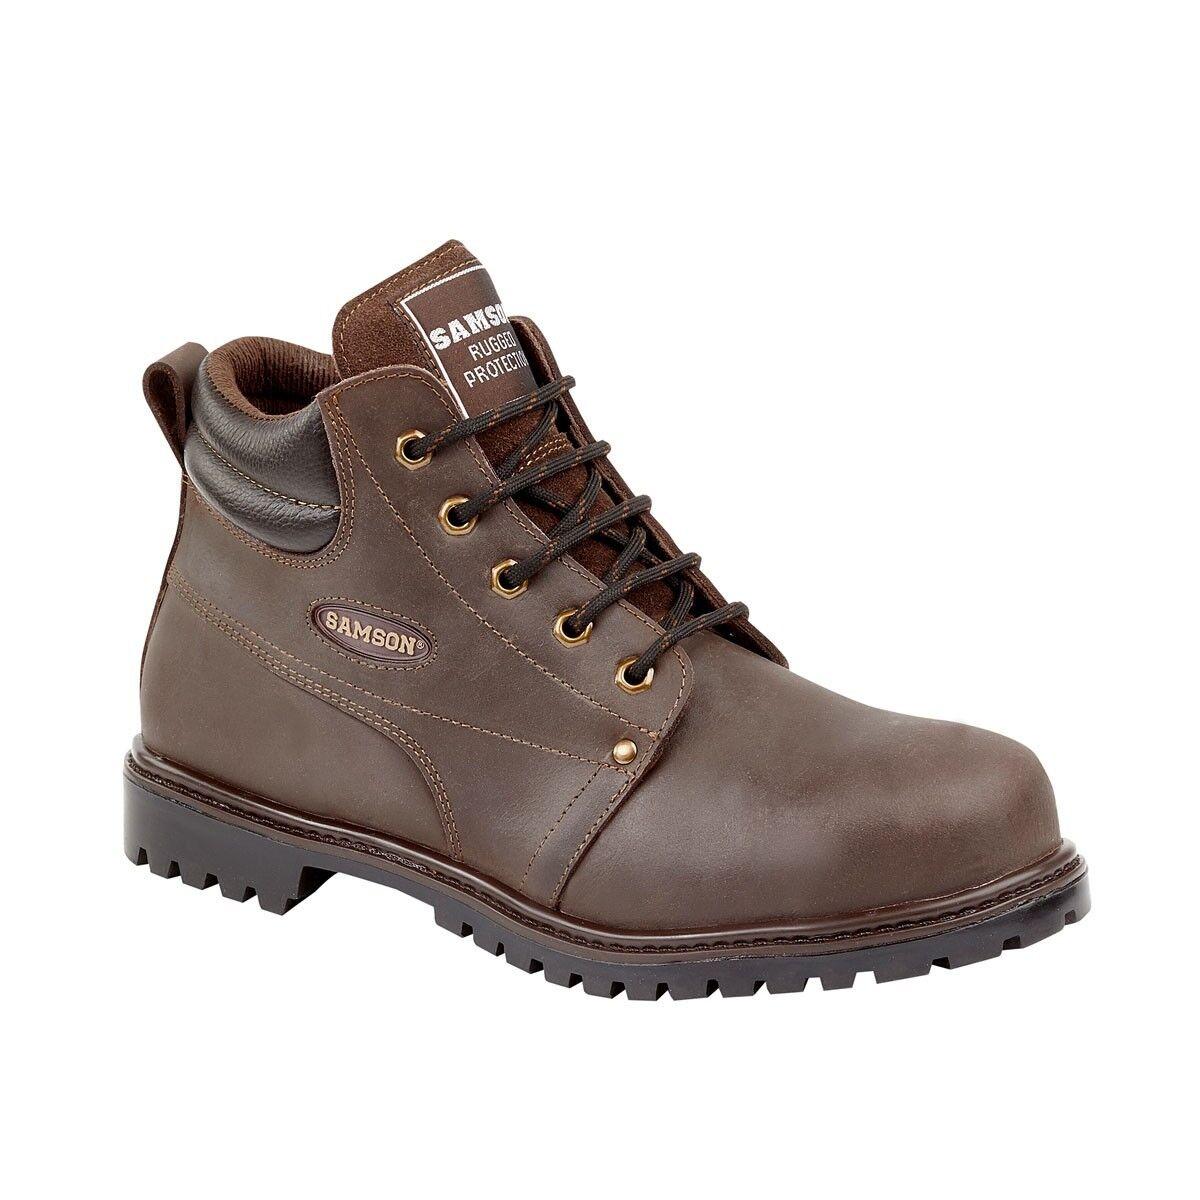 Samson 7704 Ciré marrón 5 Œillet zapatos Travail S3 avec Embout Coqué Acier